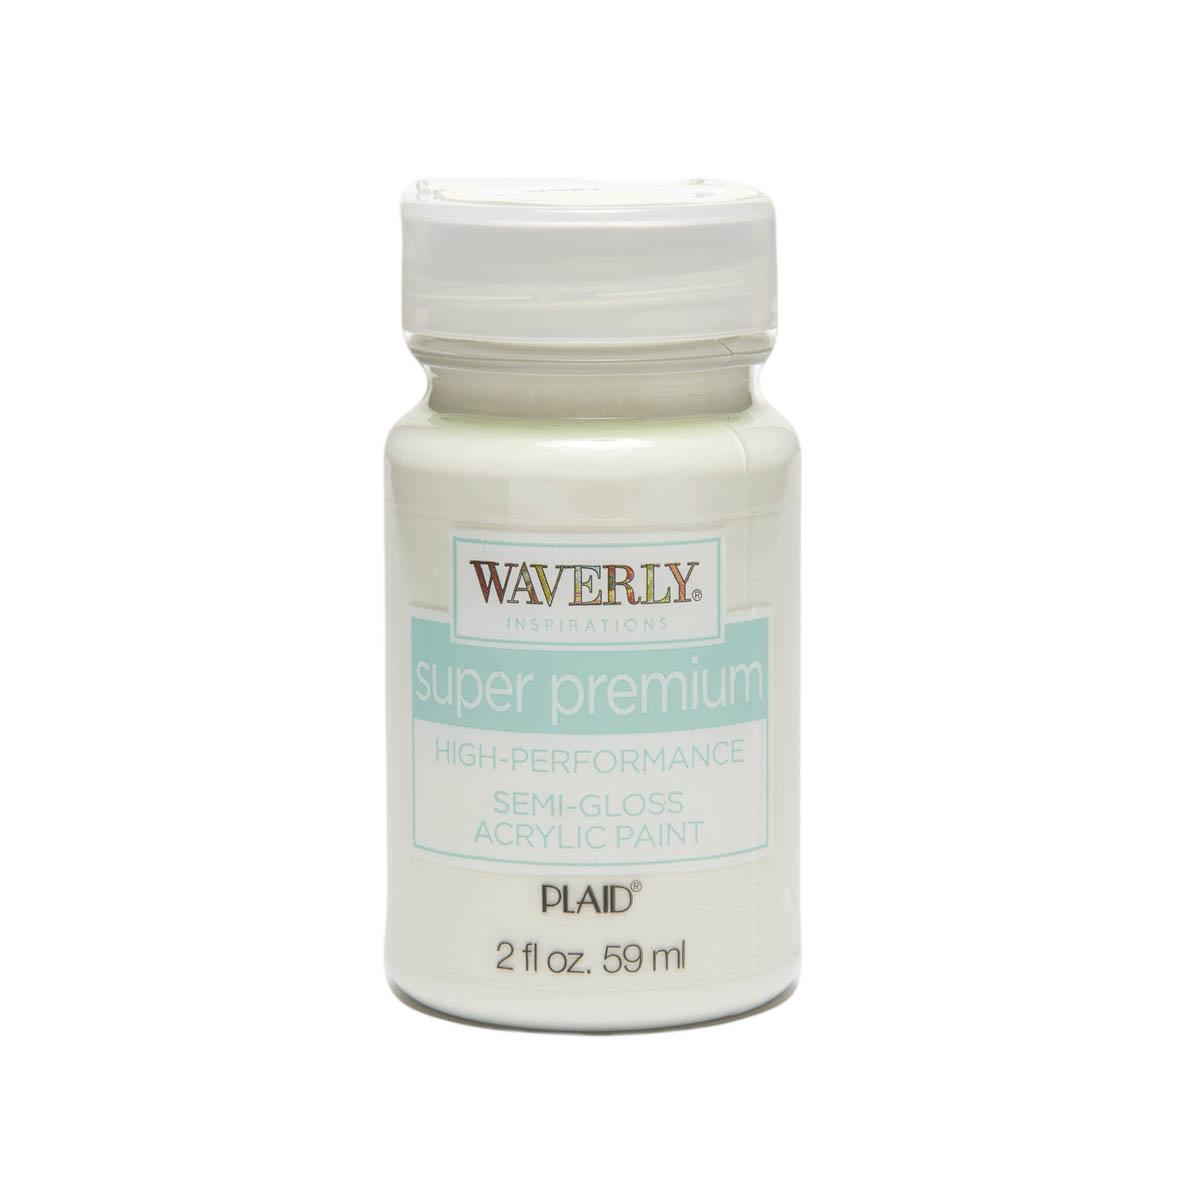 Waverly ® Inspirations Super Premium Semi-Gloss Acrylic Paint - Ivory, 2 oz.